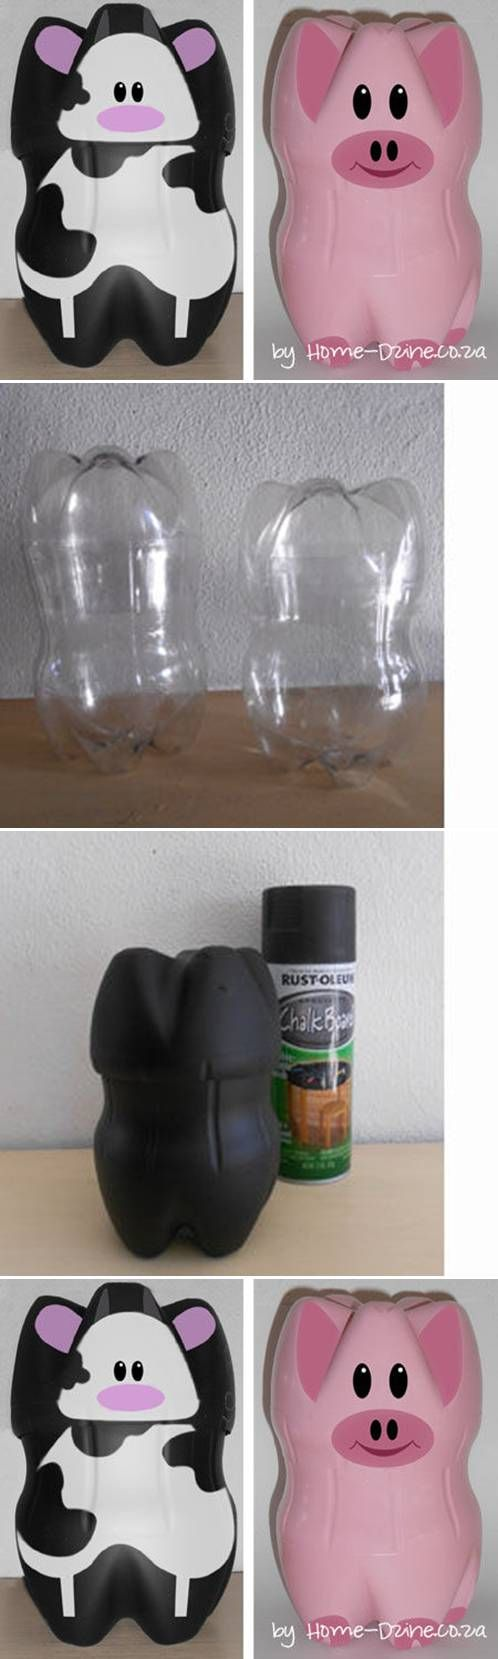 DIY Plastic Bottle Piggy Banks.